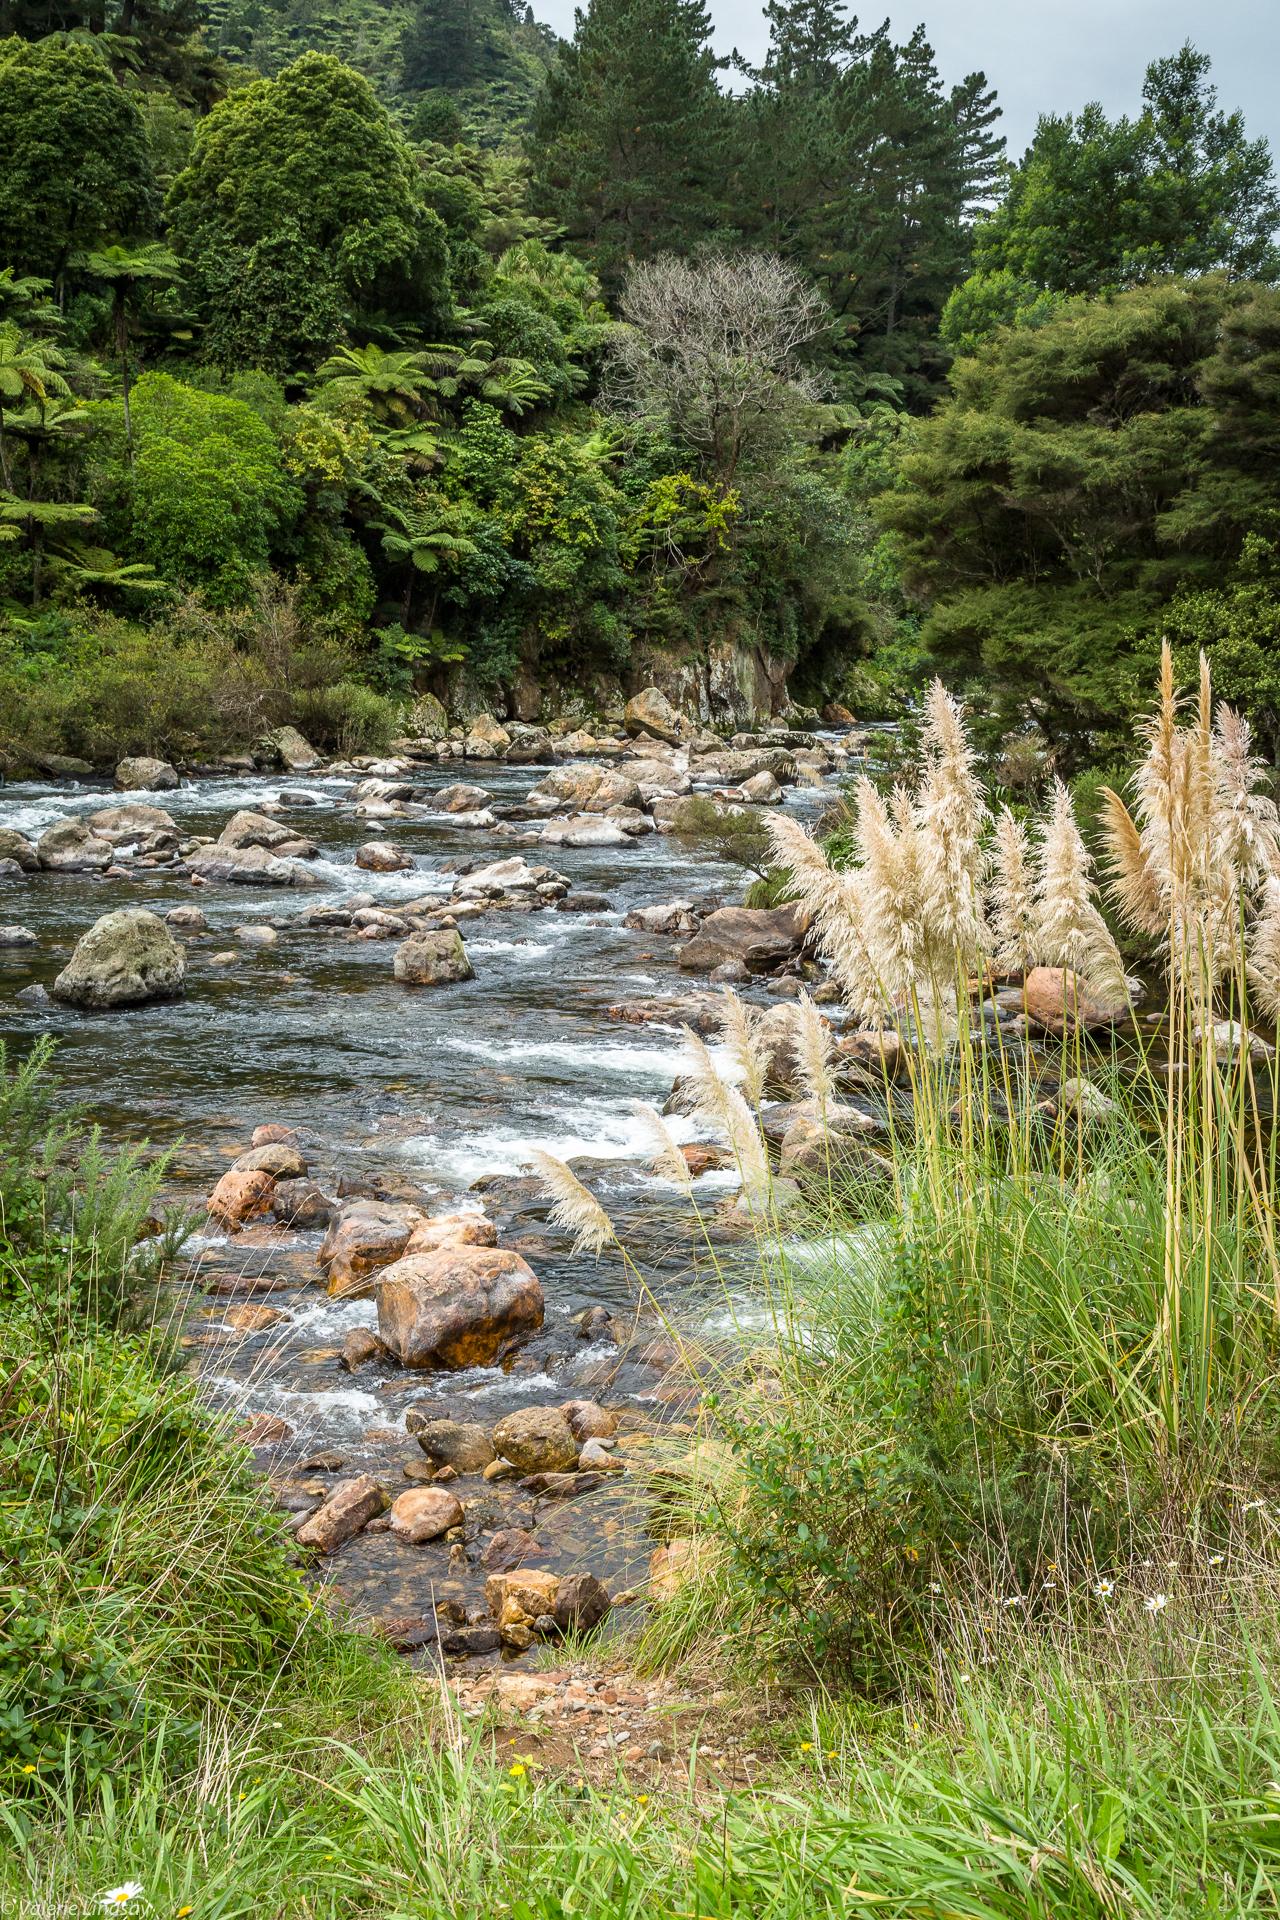 Stream flowing through the rain forest